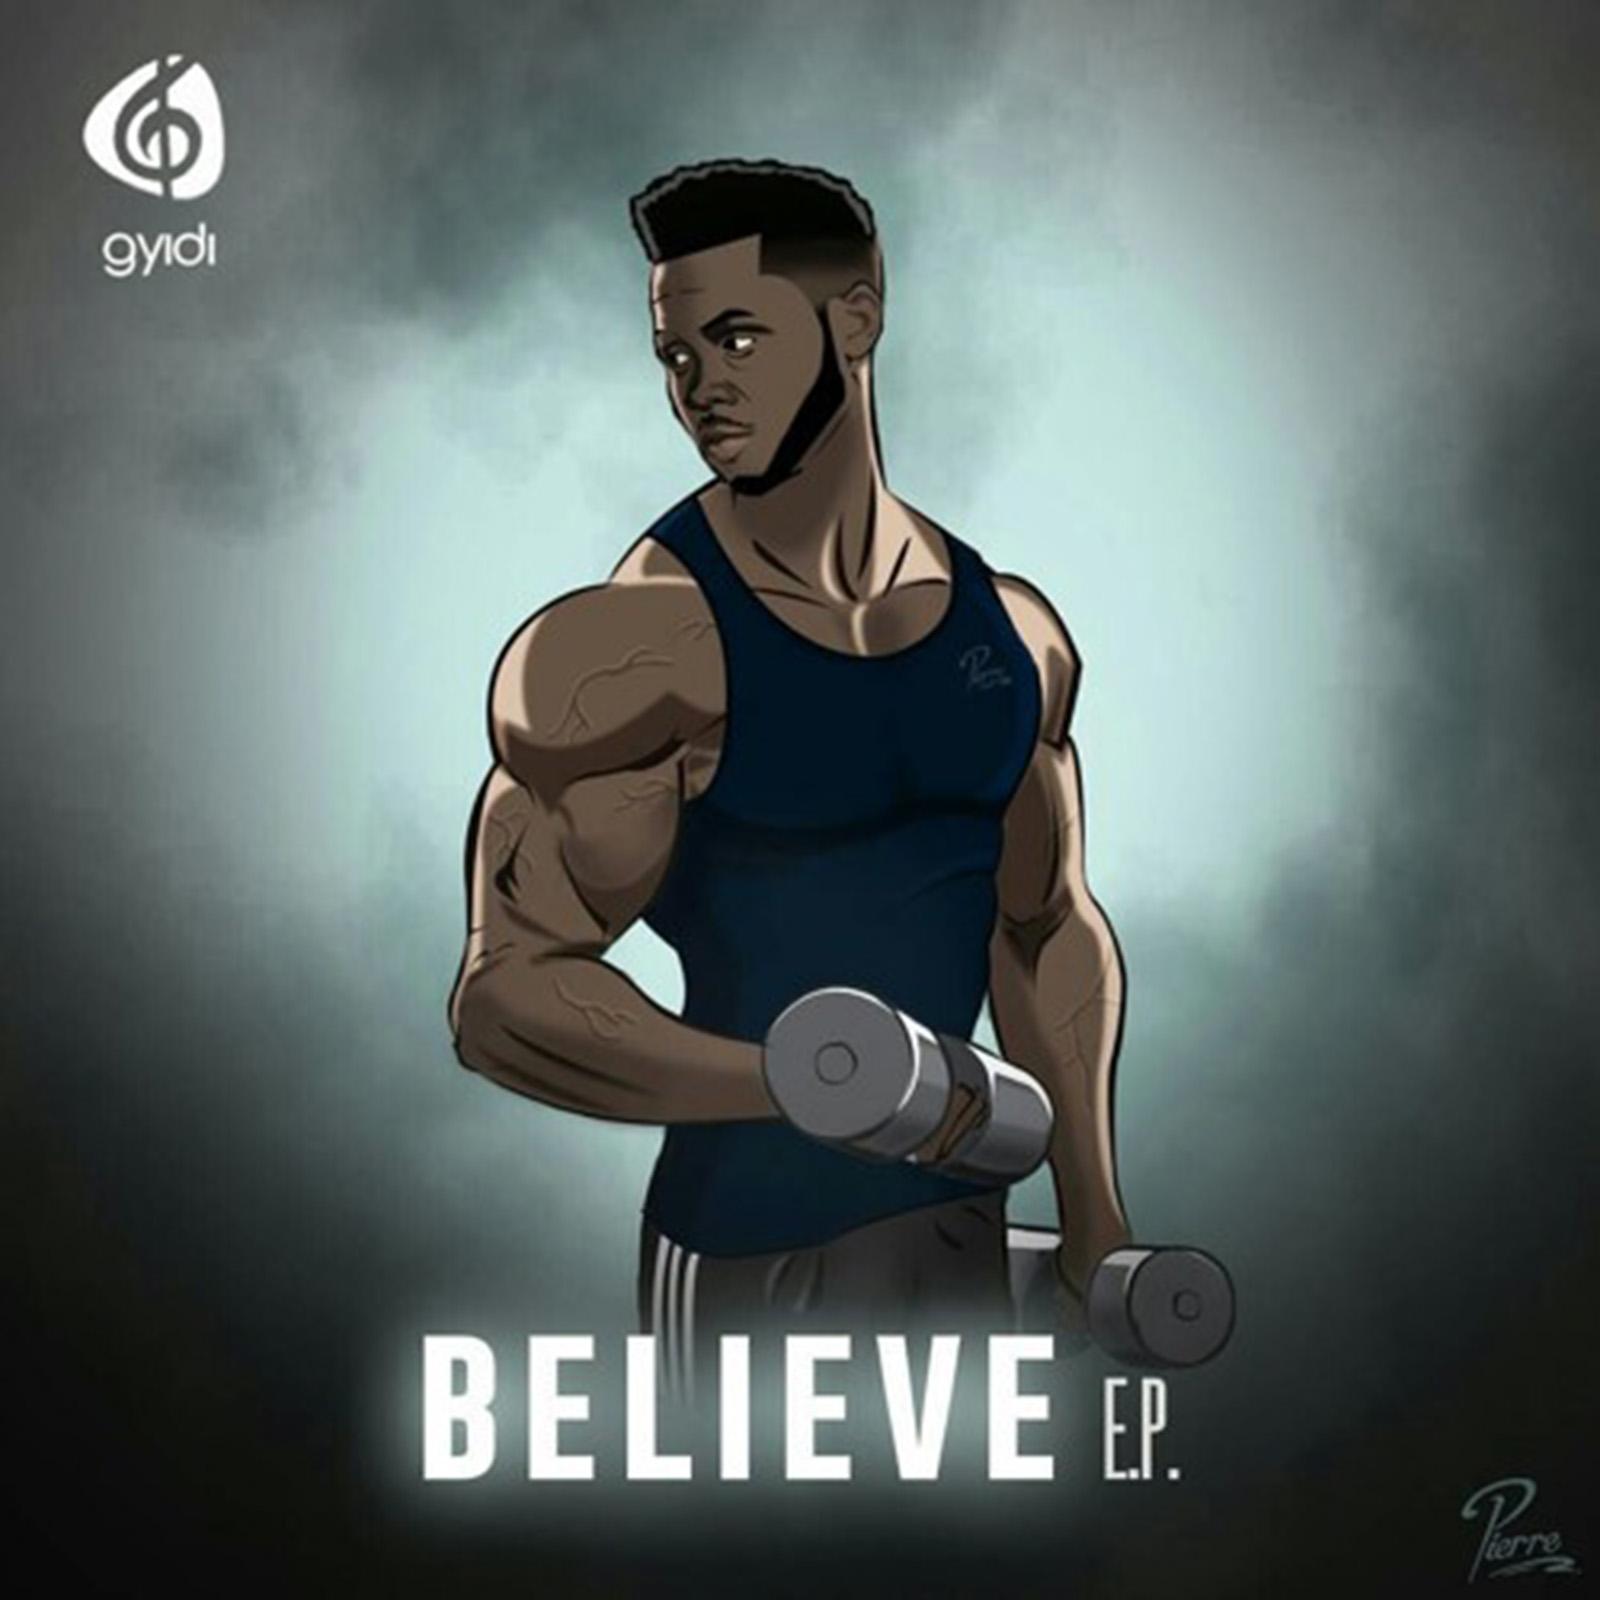 Believe EP by Gyidi